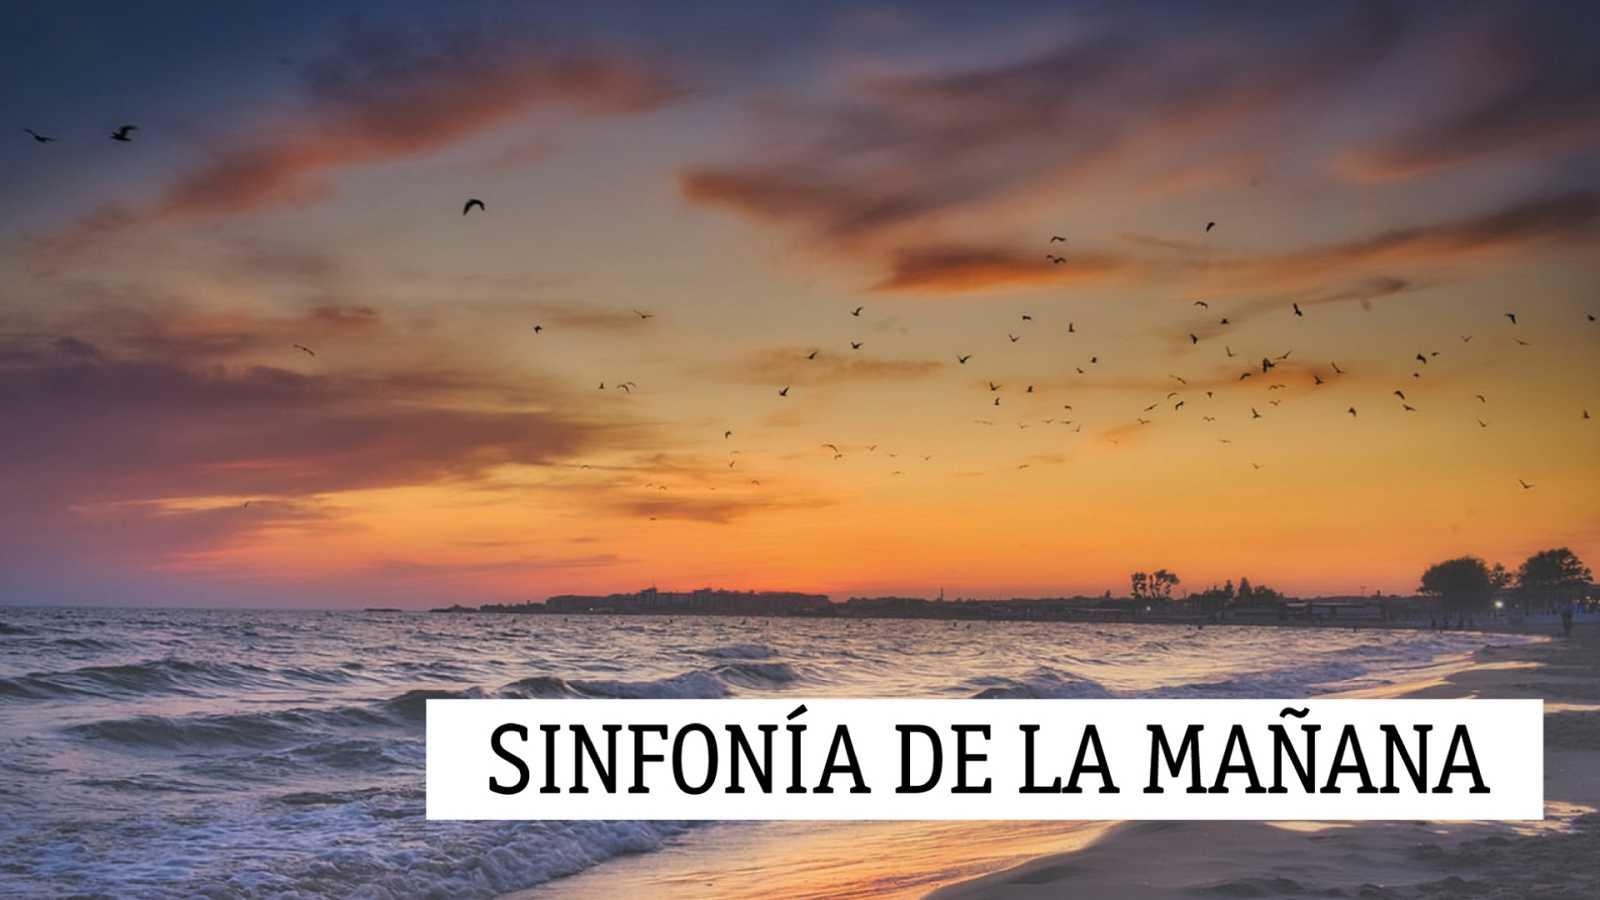 Sinfonía de la mañana - Carl Nielsen - 04/03/21 - escuchar ahora